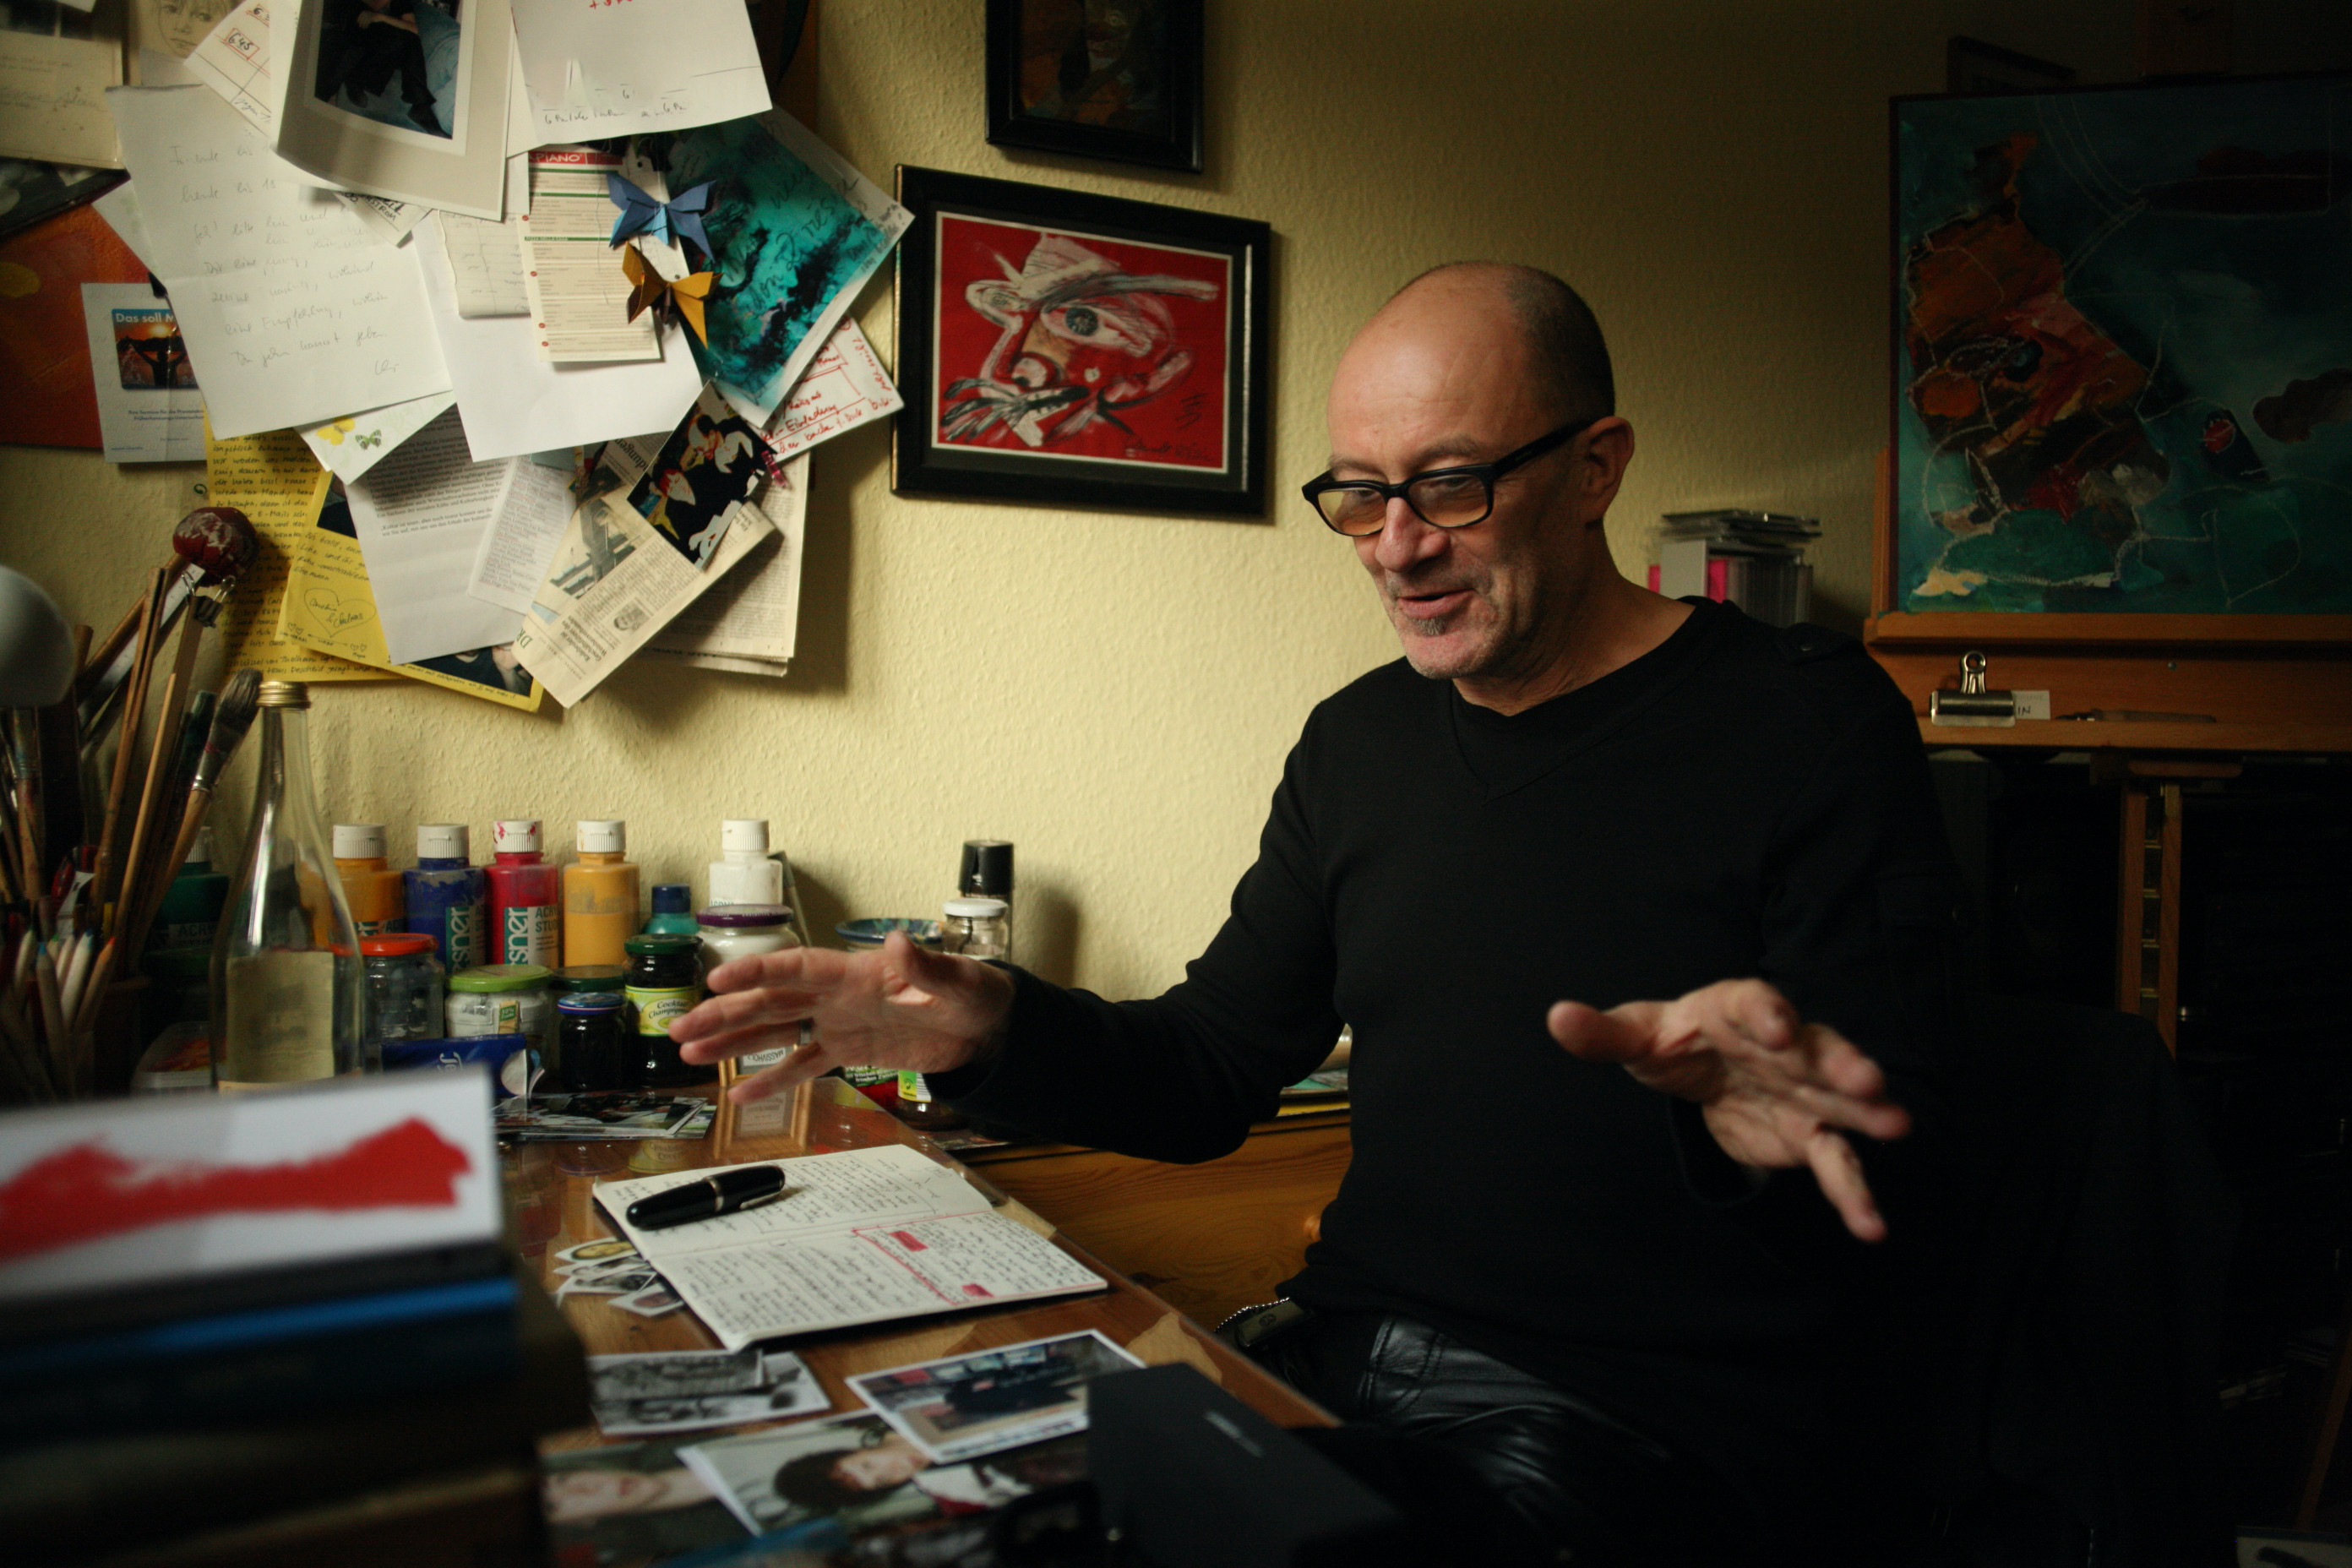 Künstler Dirk Hille